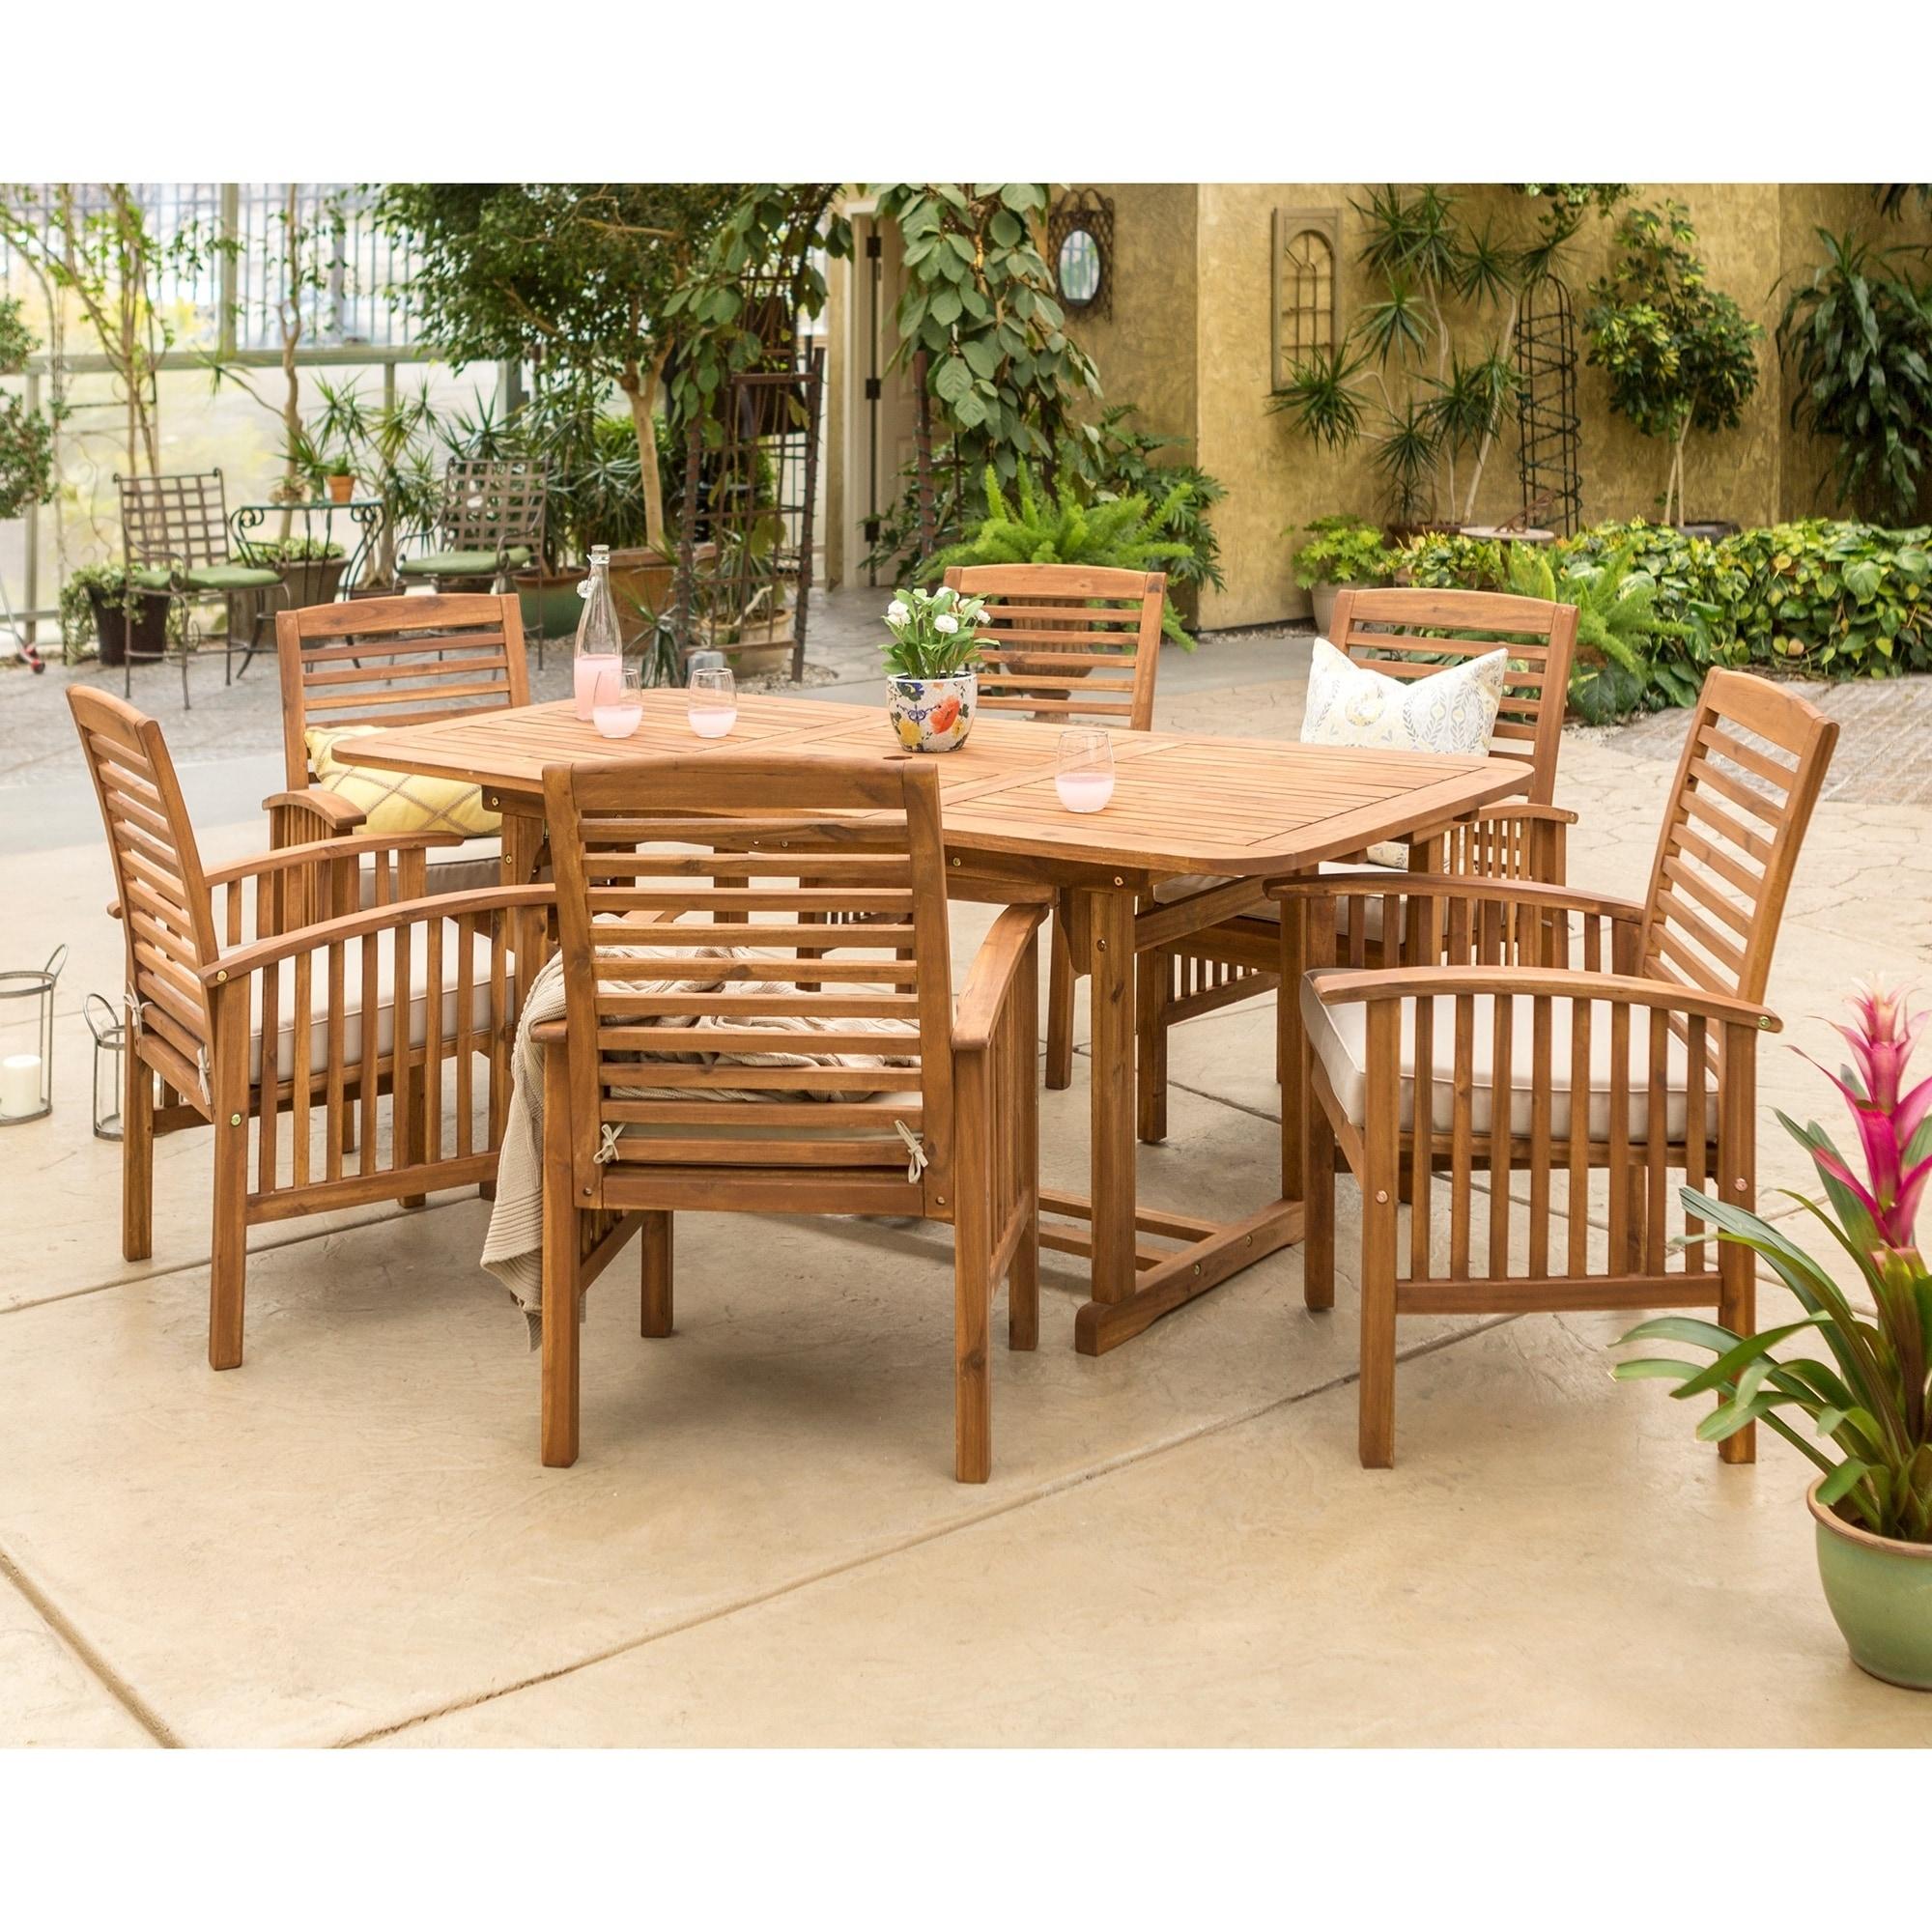 outdoor solid yardistry ft gazebo avery reviews x patio pdx d wayfair wood pavilion w